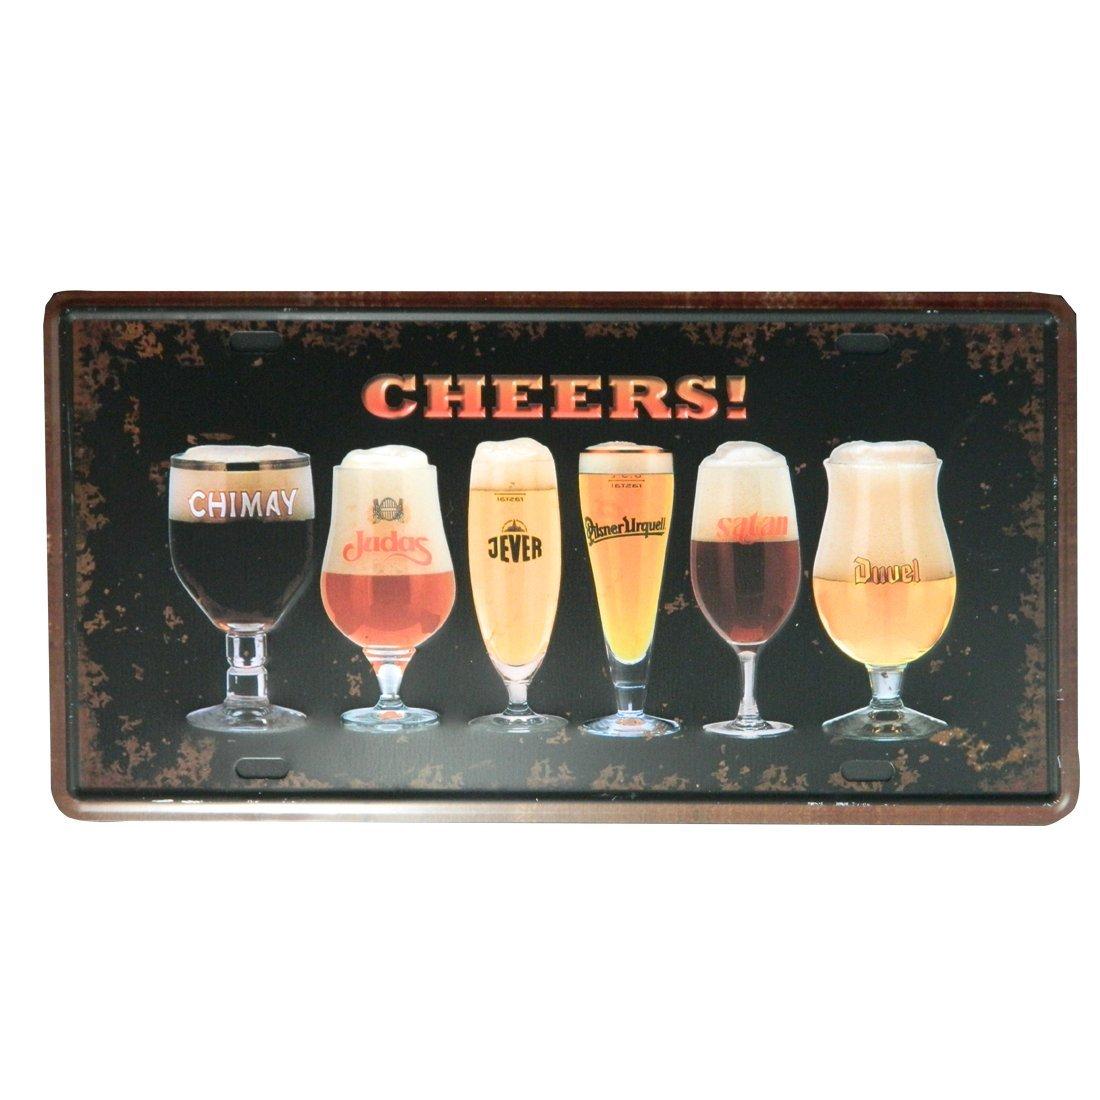 IPEKOO Whisky JACK DANIELS-Metal Sign-Placca da muro in latta con pubblicità Vintage Pub Retro Metal Sign-15,24 cm (6) 30,48 (12 x cm, A 24 cm (6) 30